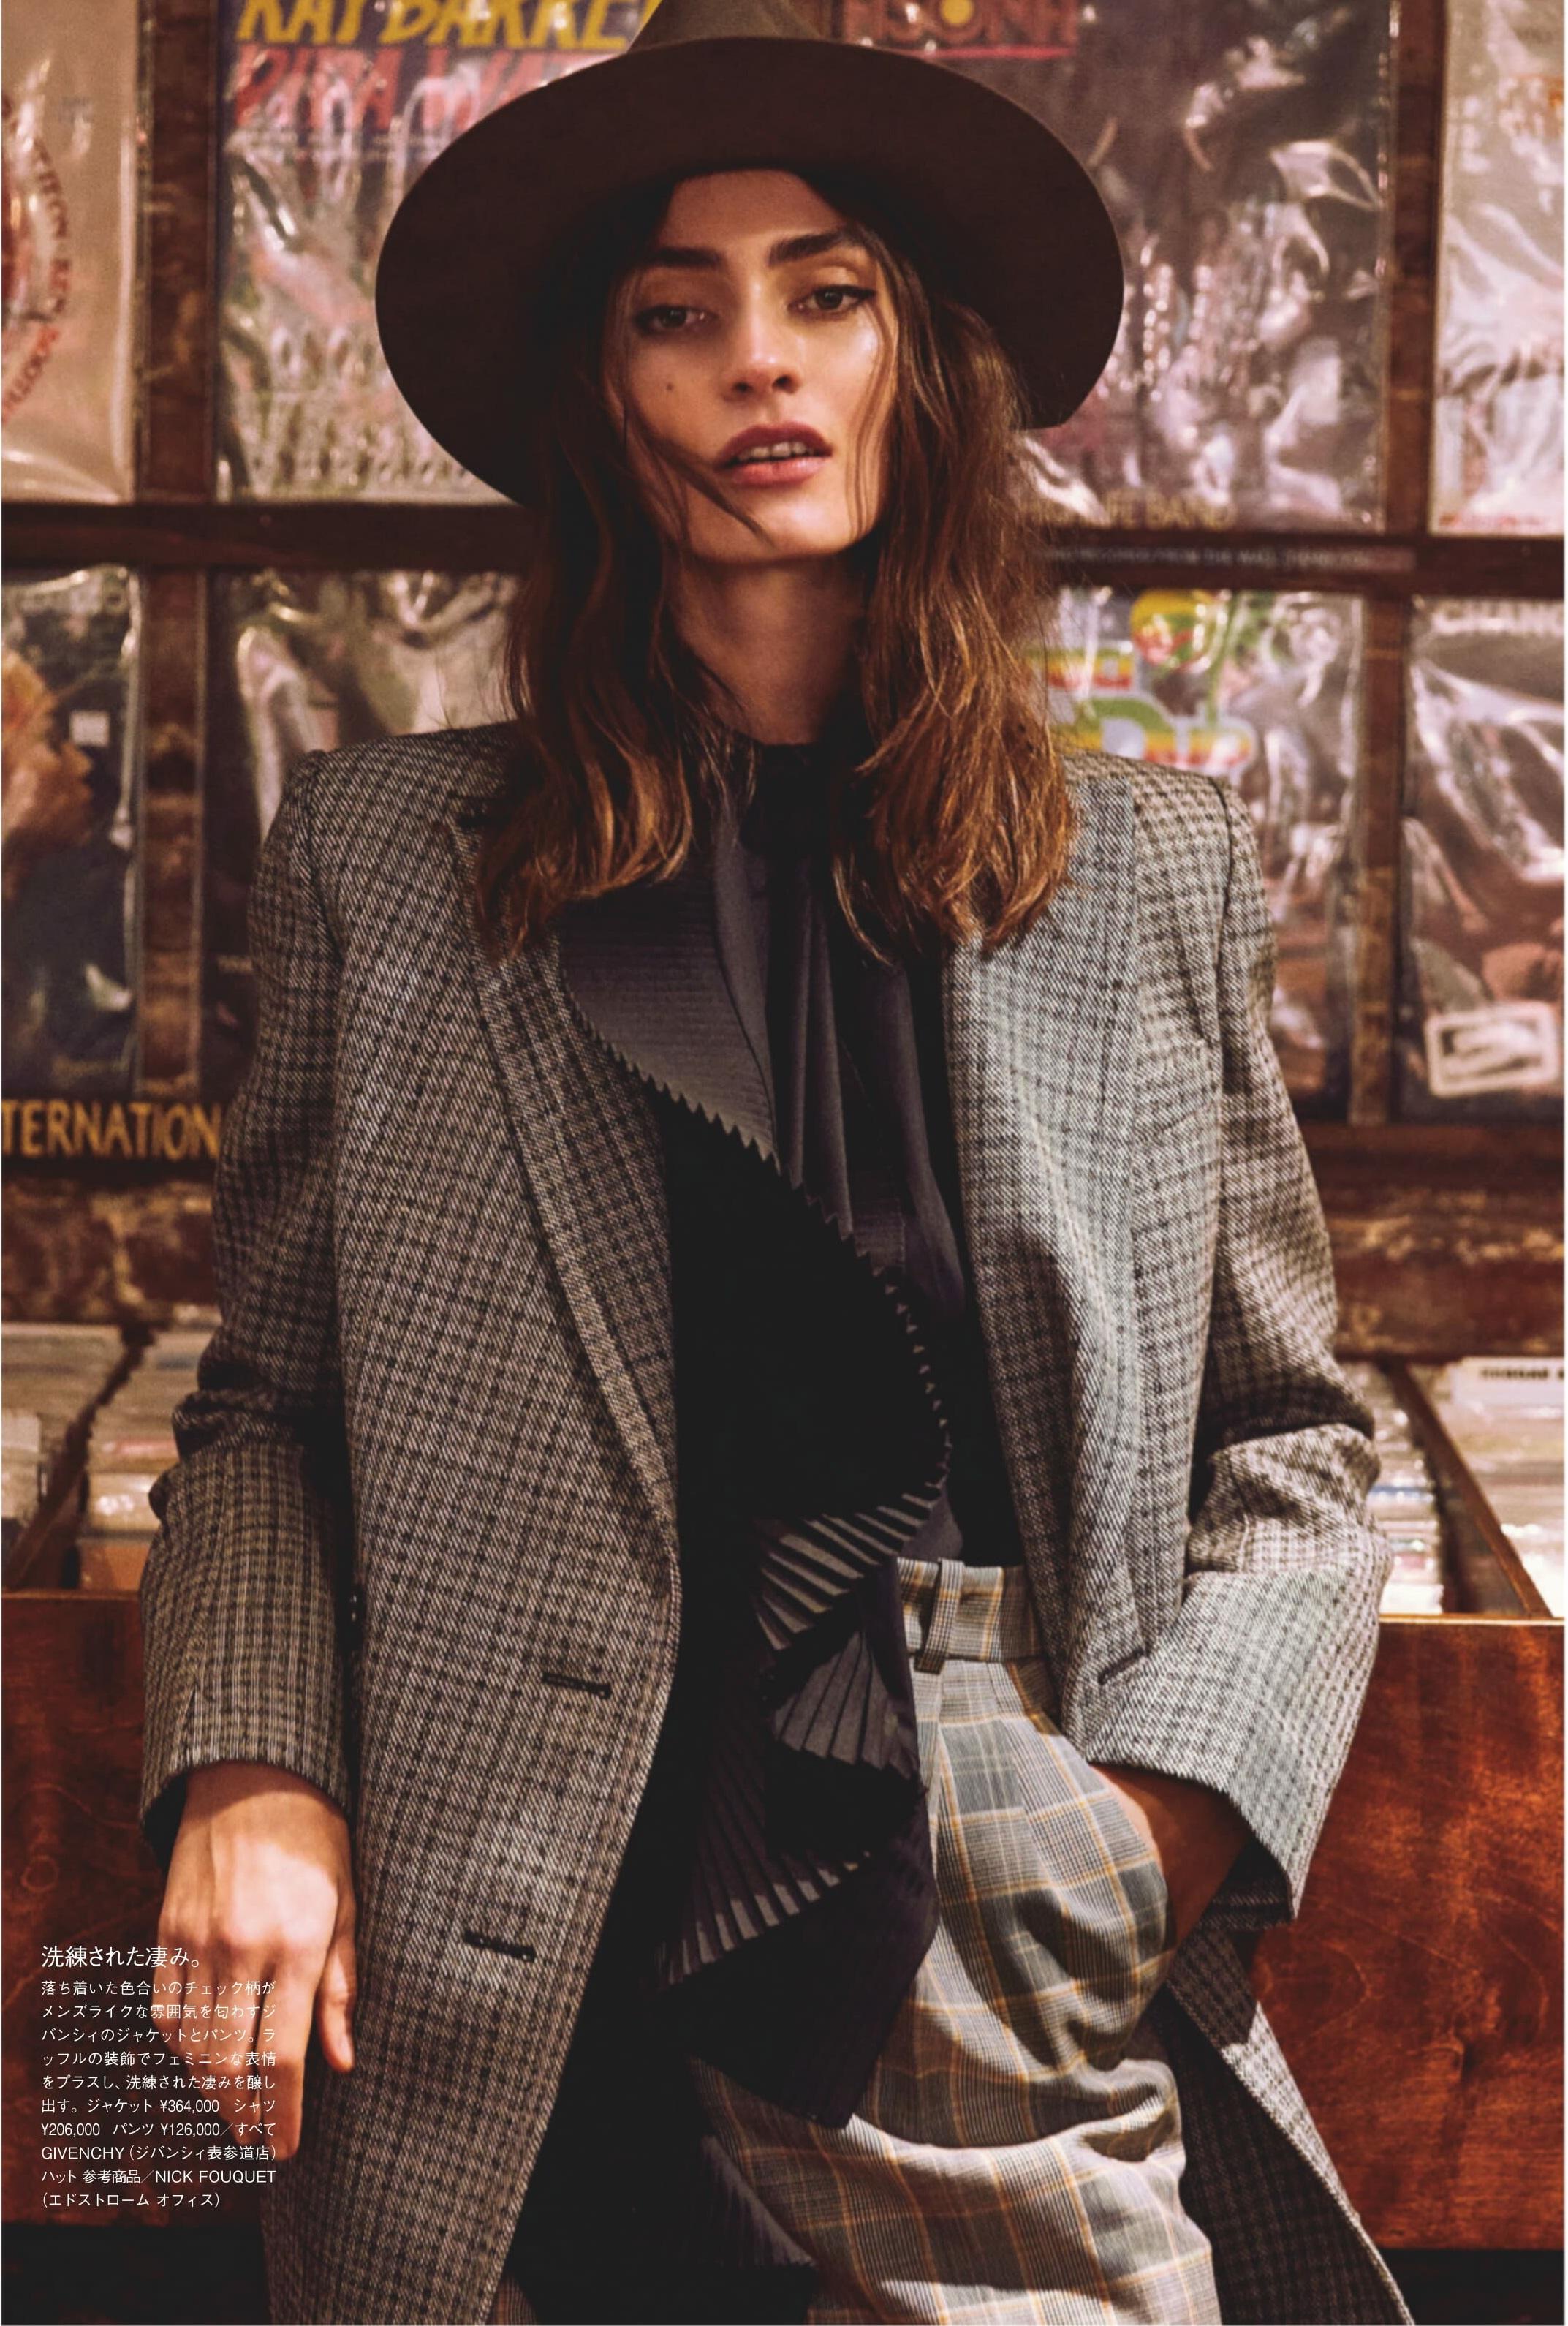 Walter Chin for Vogue Japan Feb 2019 (8).jpg